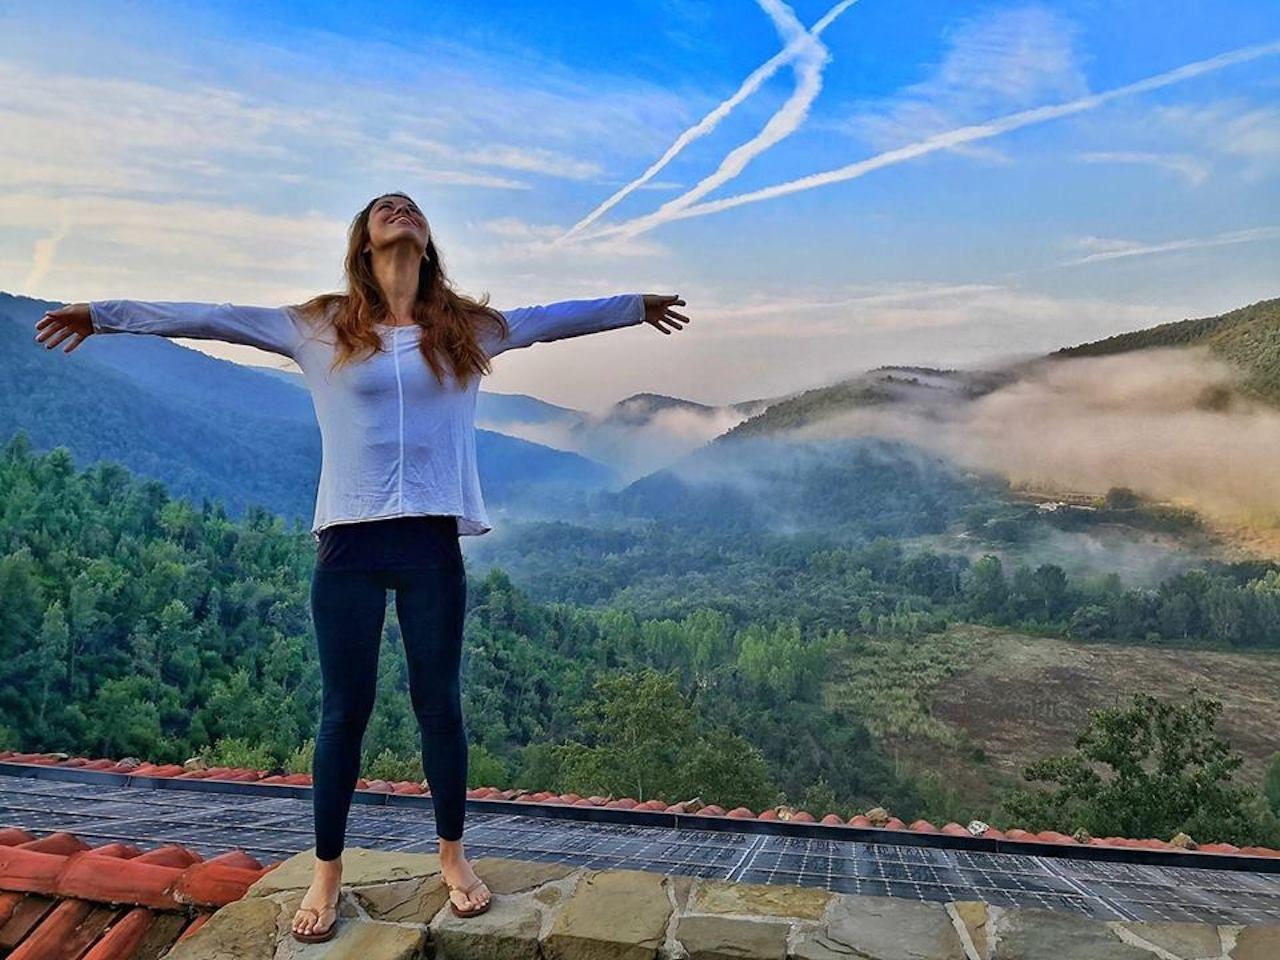 solo female traveler at the Eremito monastery